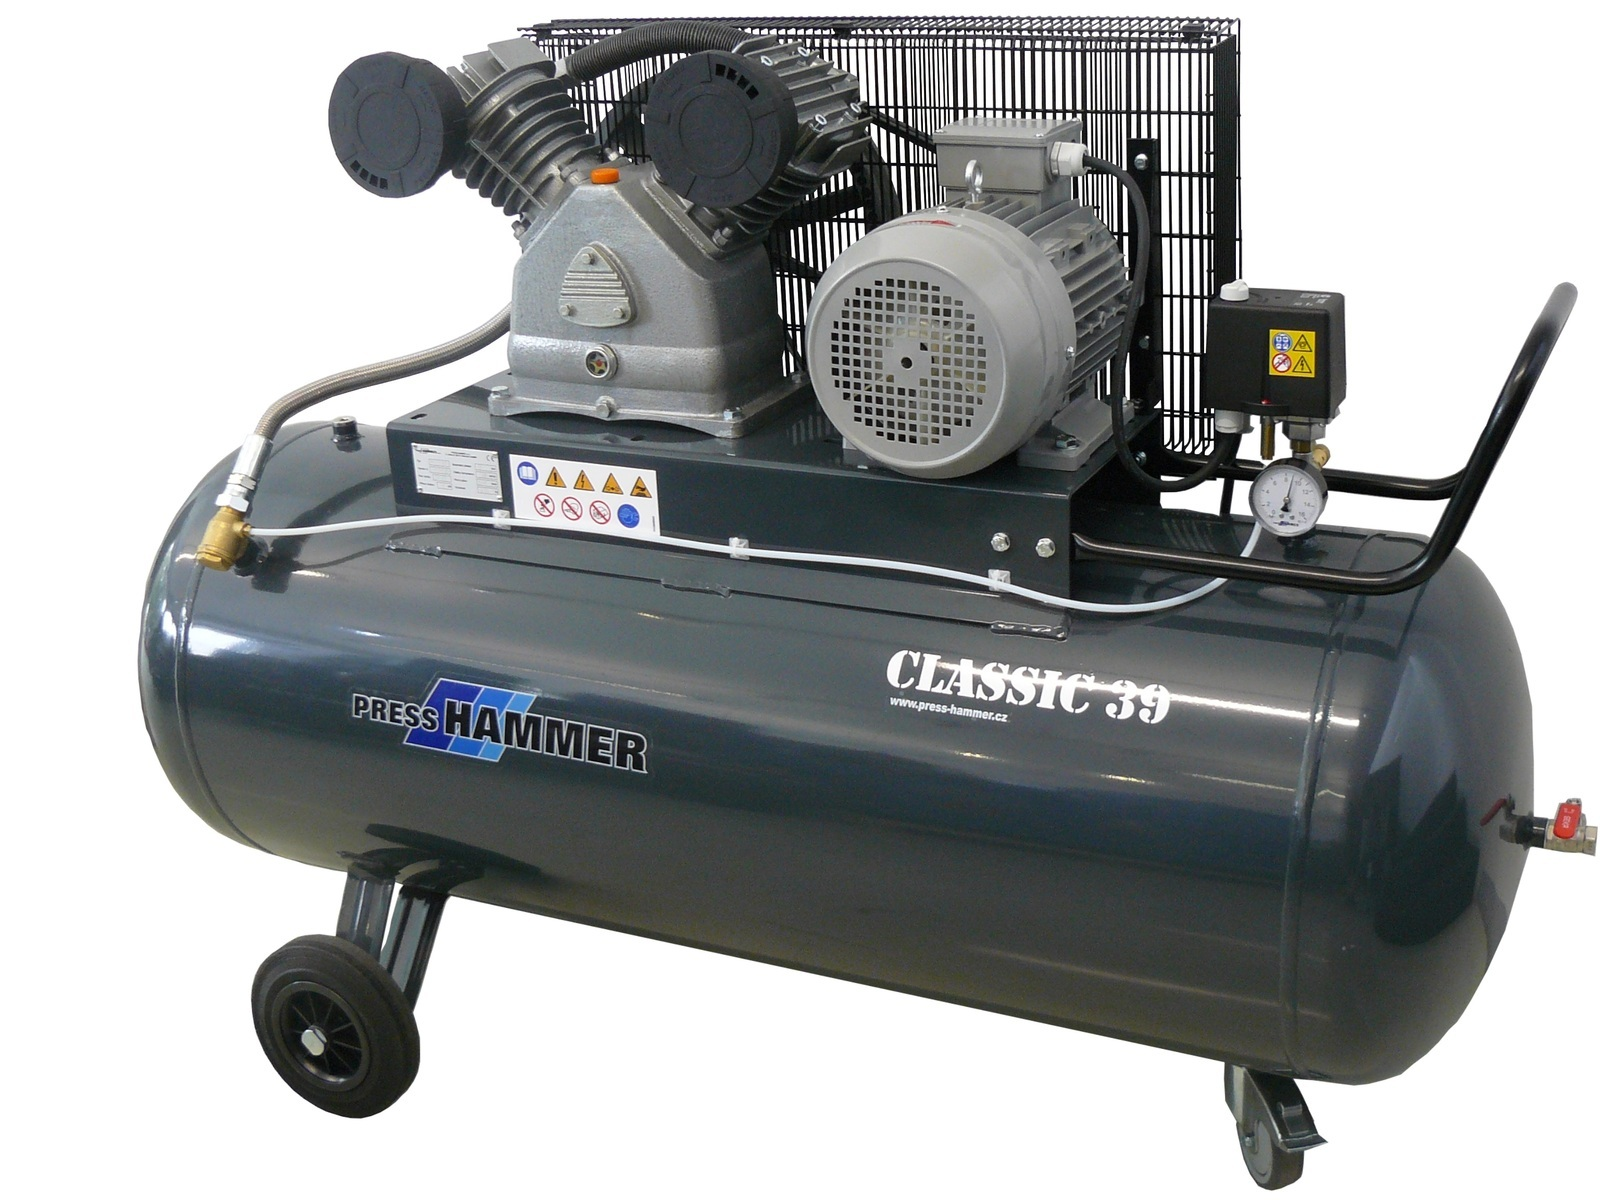 Pístový kompresor 270l 4kw- PRESS-HAMMER Classic 39/270